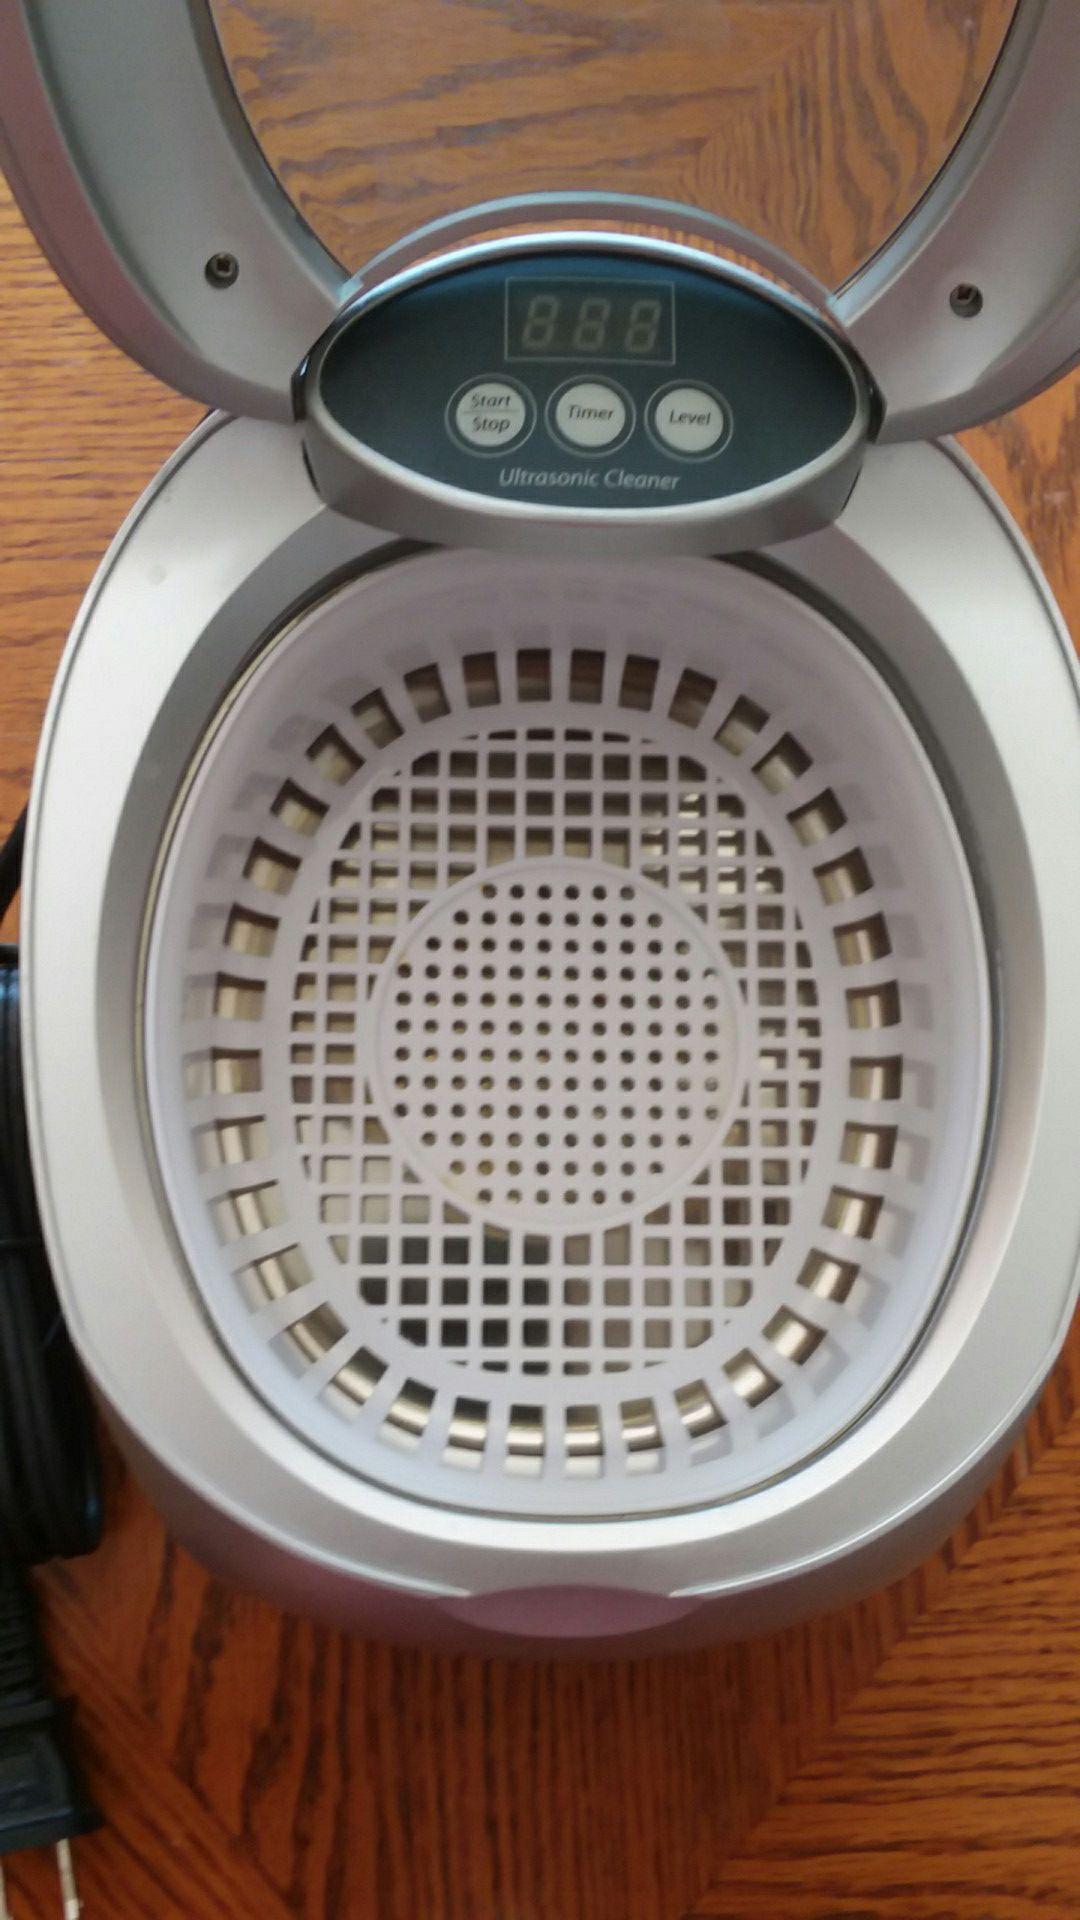 Brookstone ultrasonic cleaner